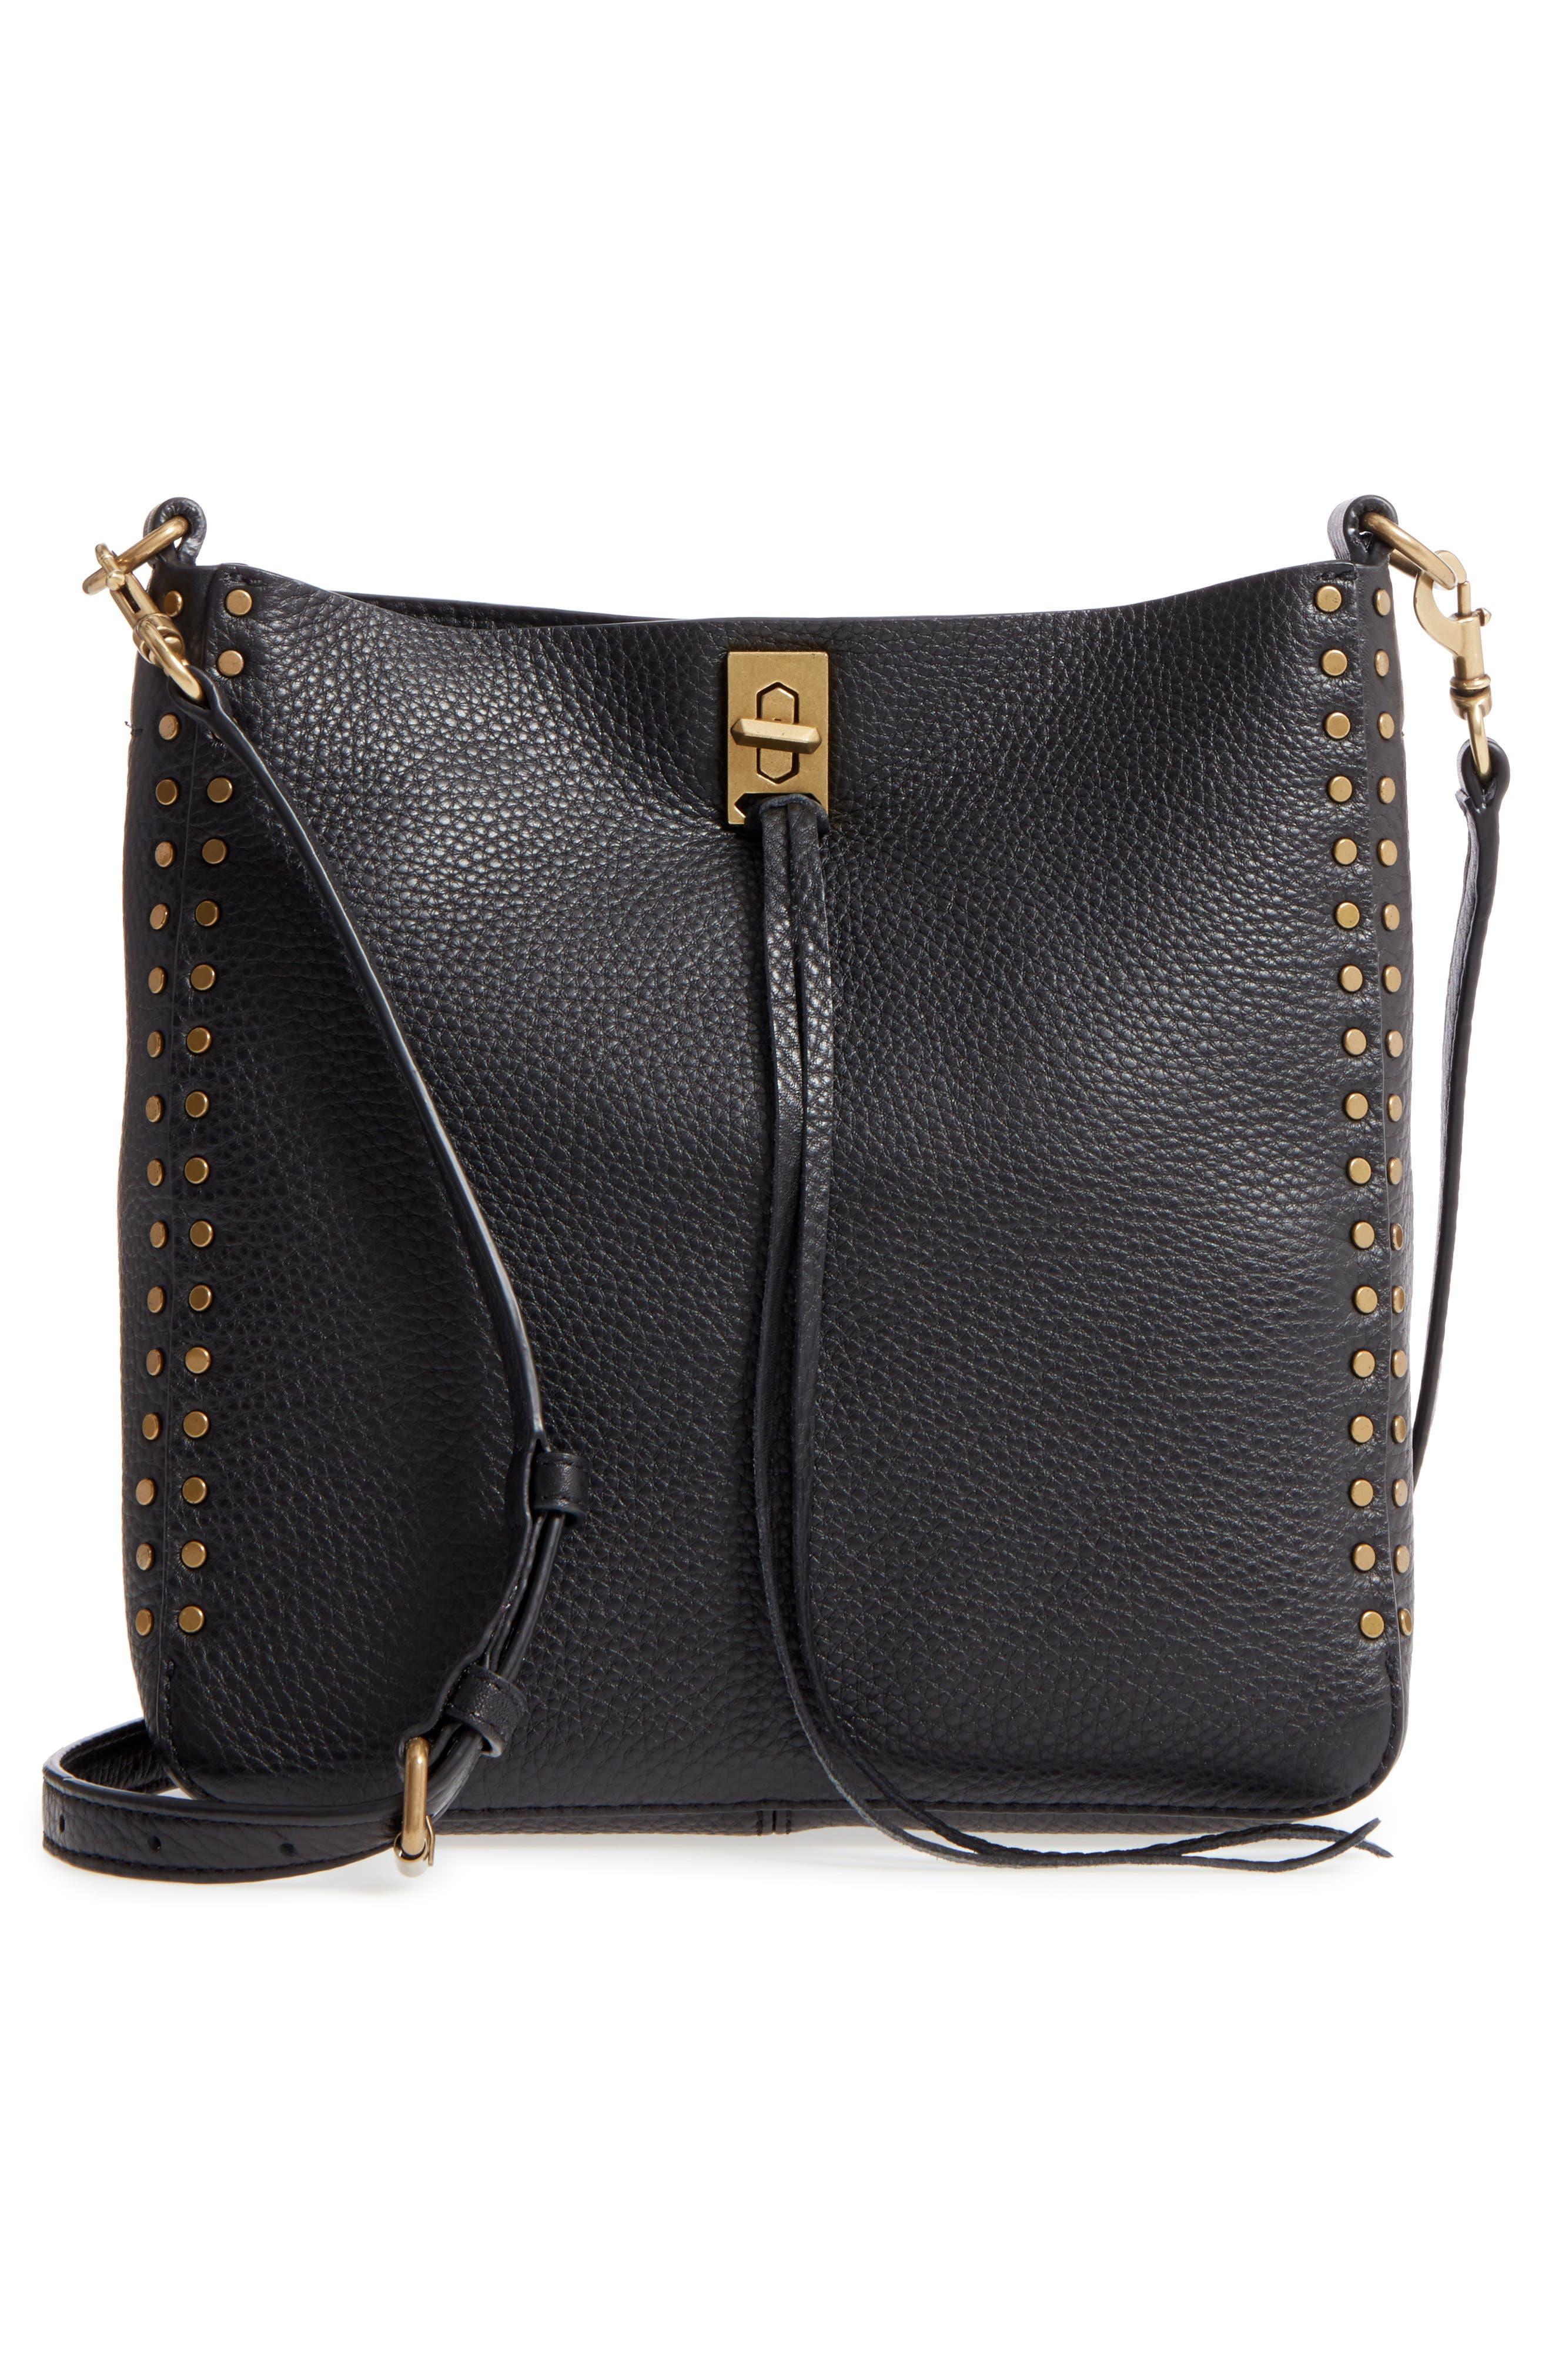 REBECCA MINKOFF, Small Darren Deerskin Leather Feed Bag, Alternate thumbnail 3, color, BLACK